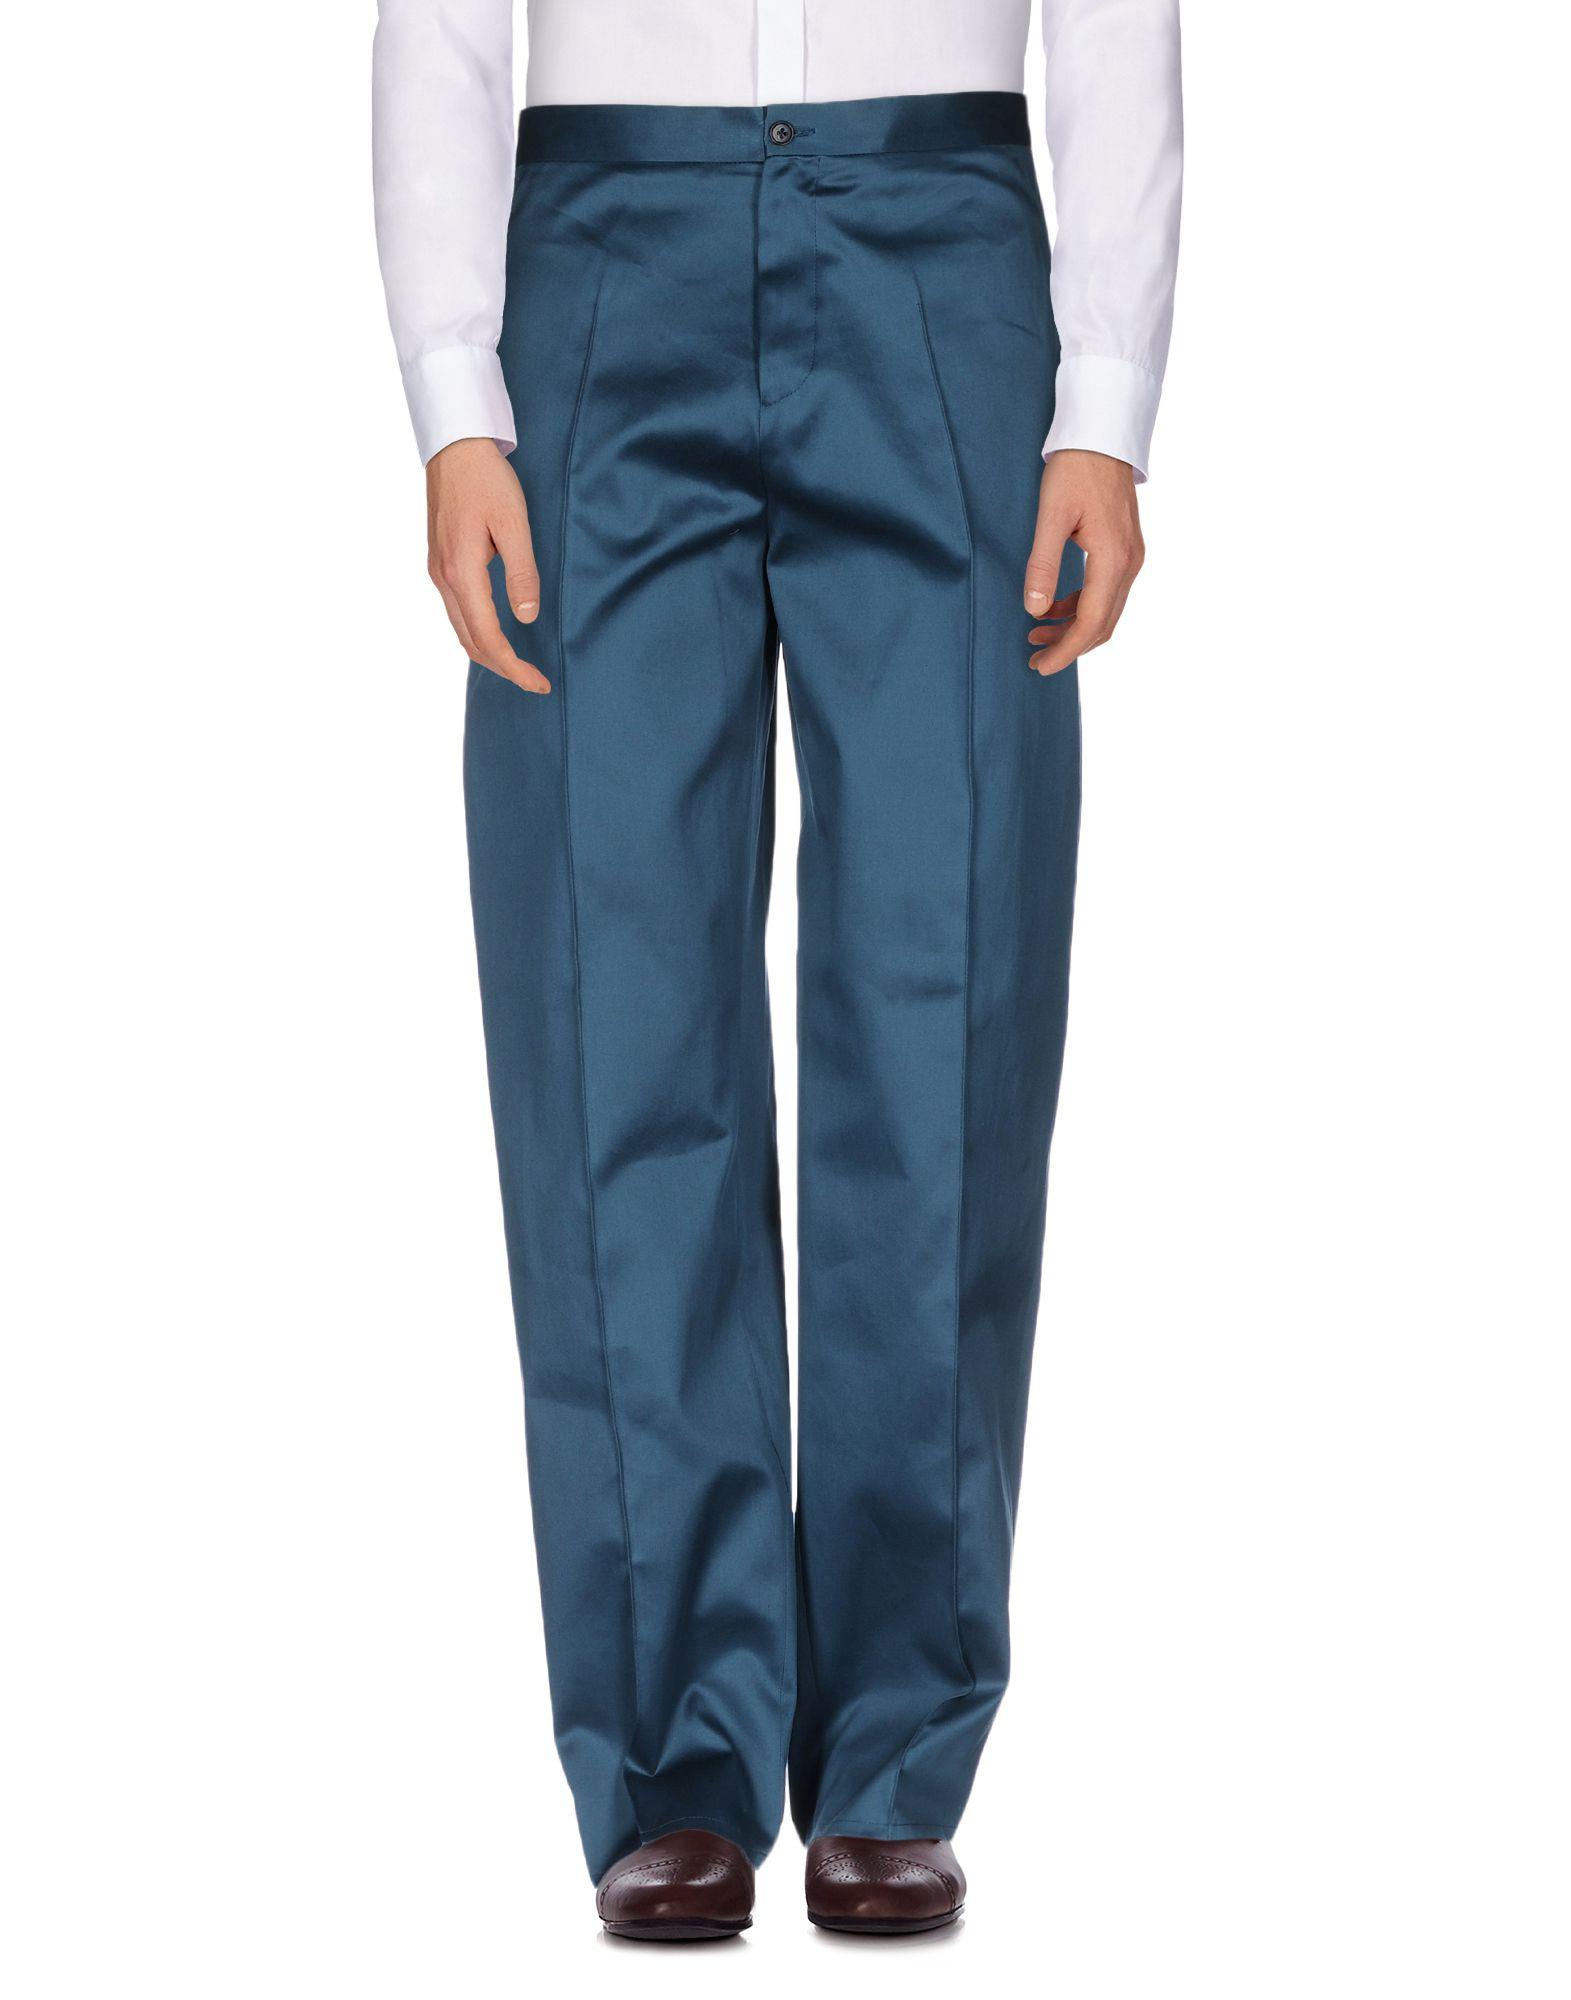 Pantalone Yang Li Uomo - Acquista online su